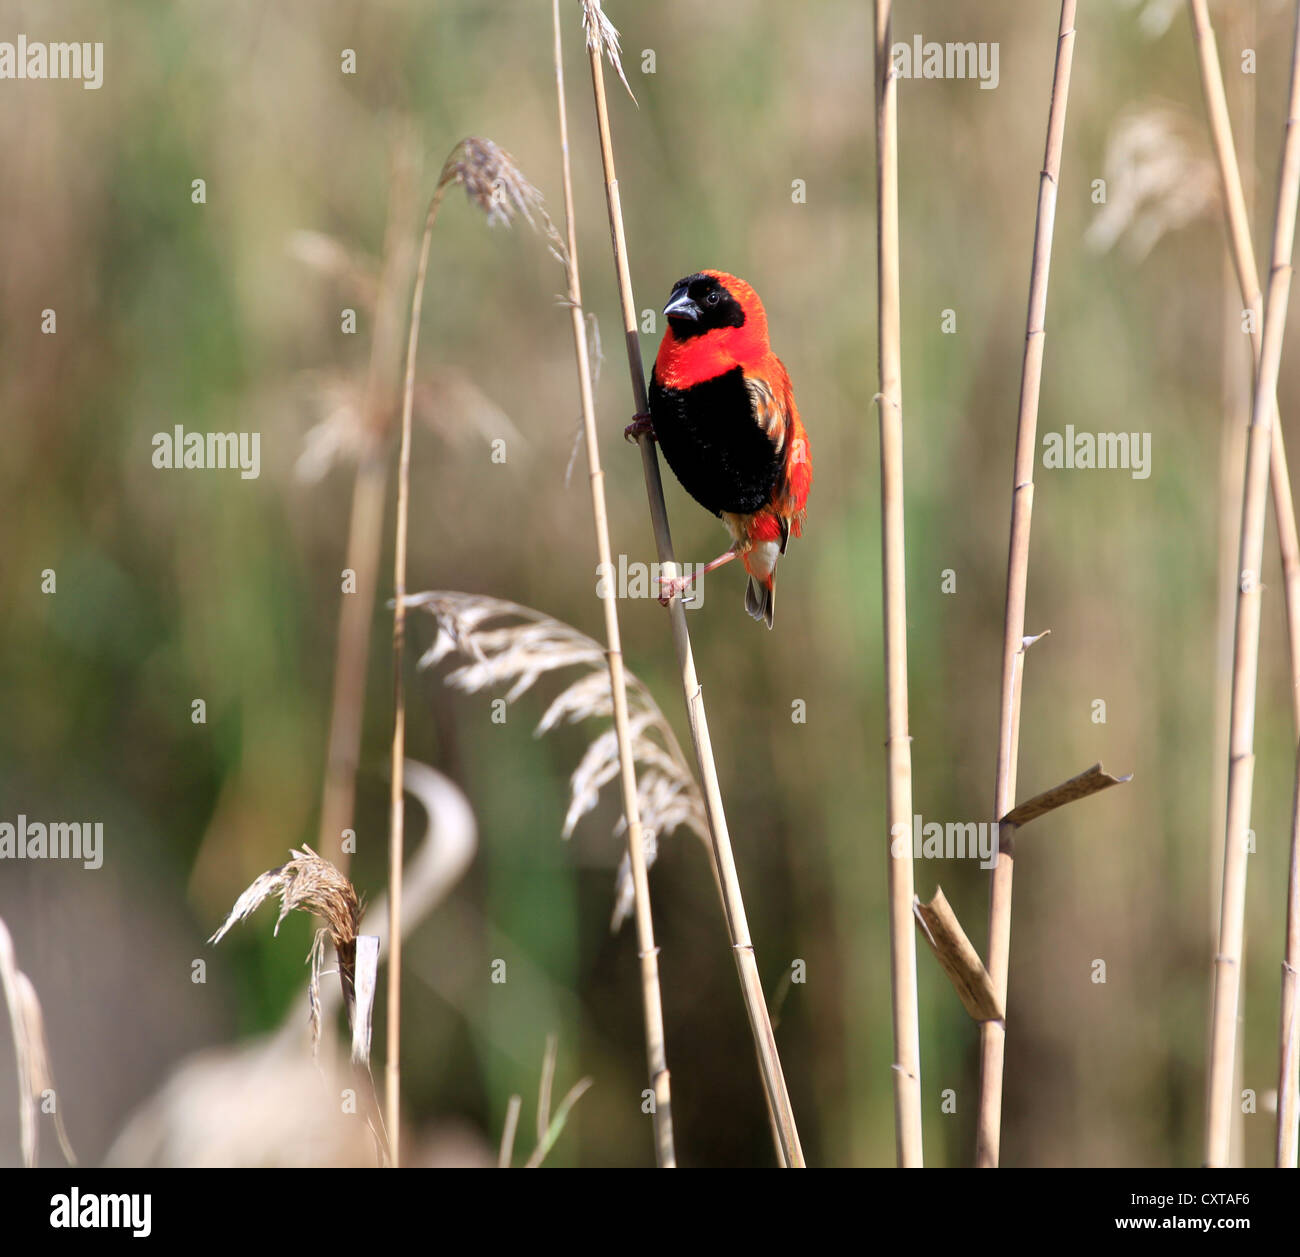 Male  Southern Red Bishop or Red Bishop (Euplectes orix) with breeding plumage. - Stock Image